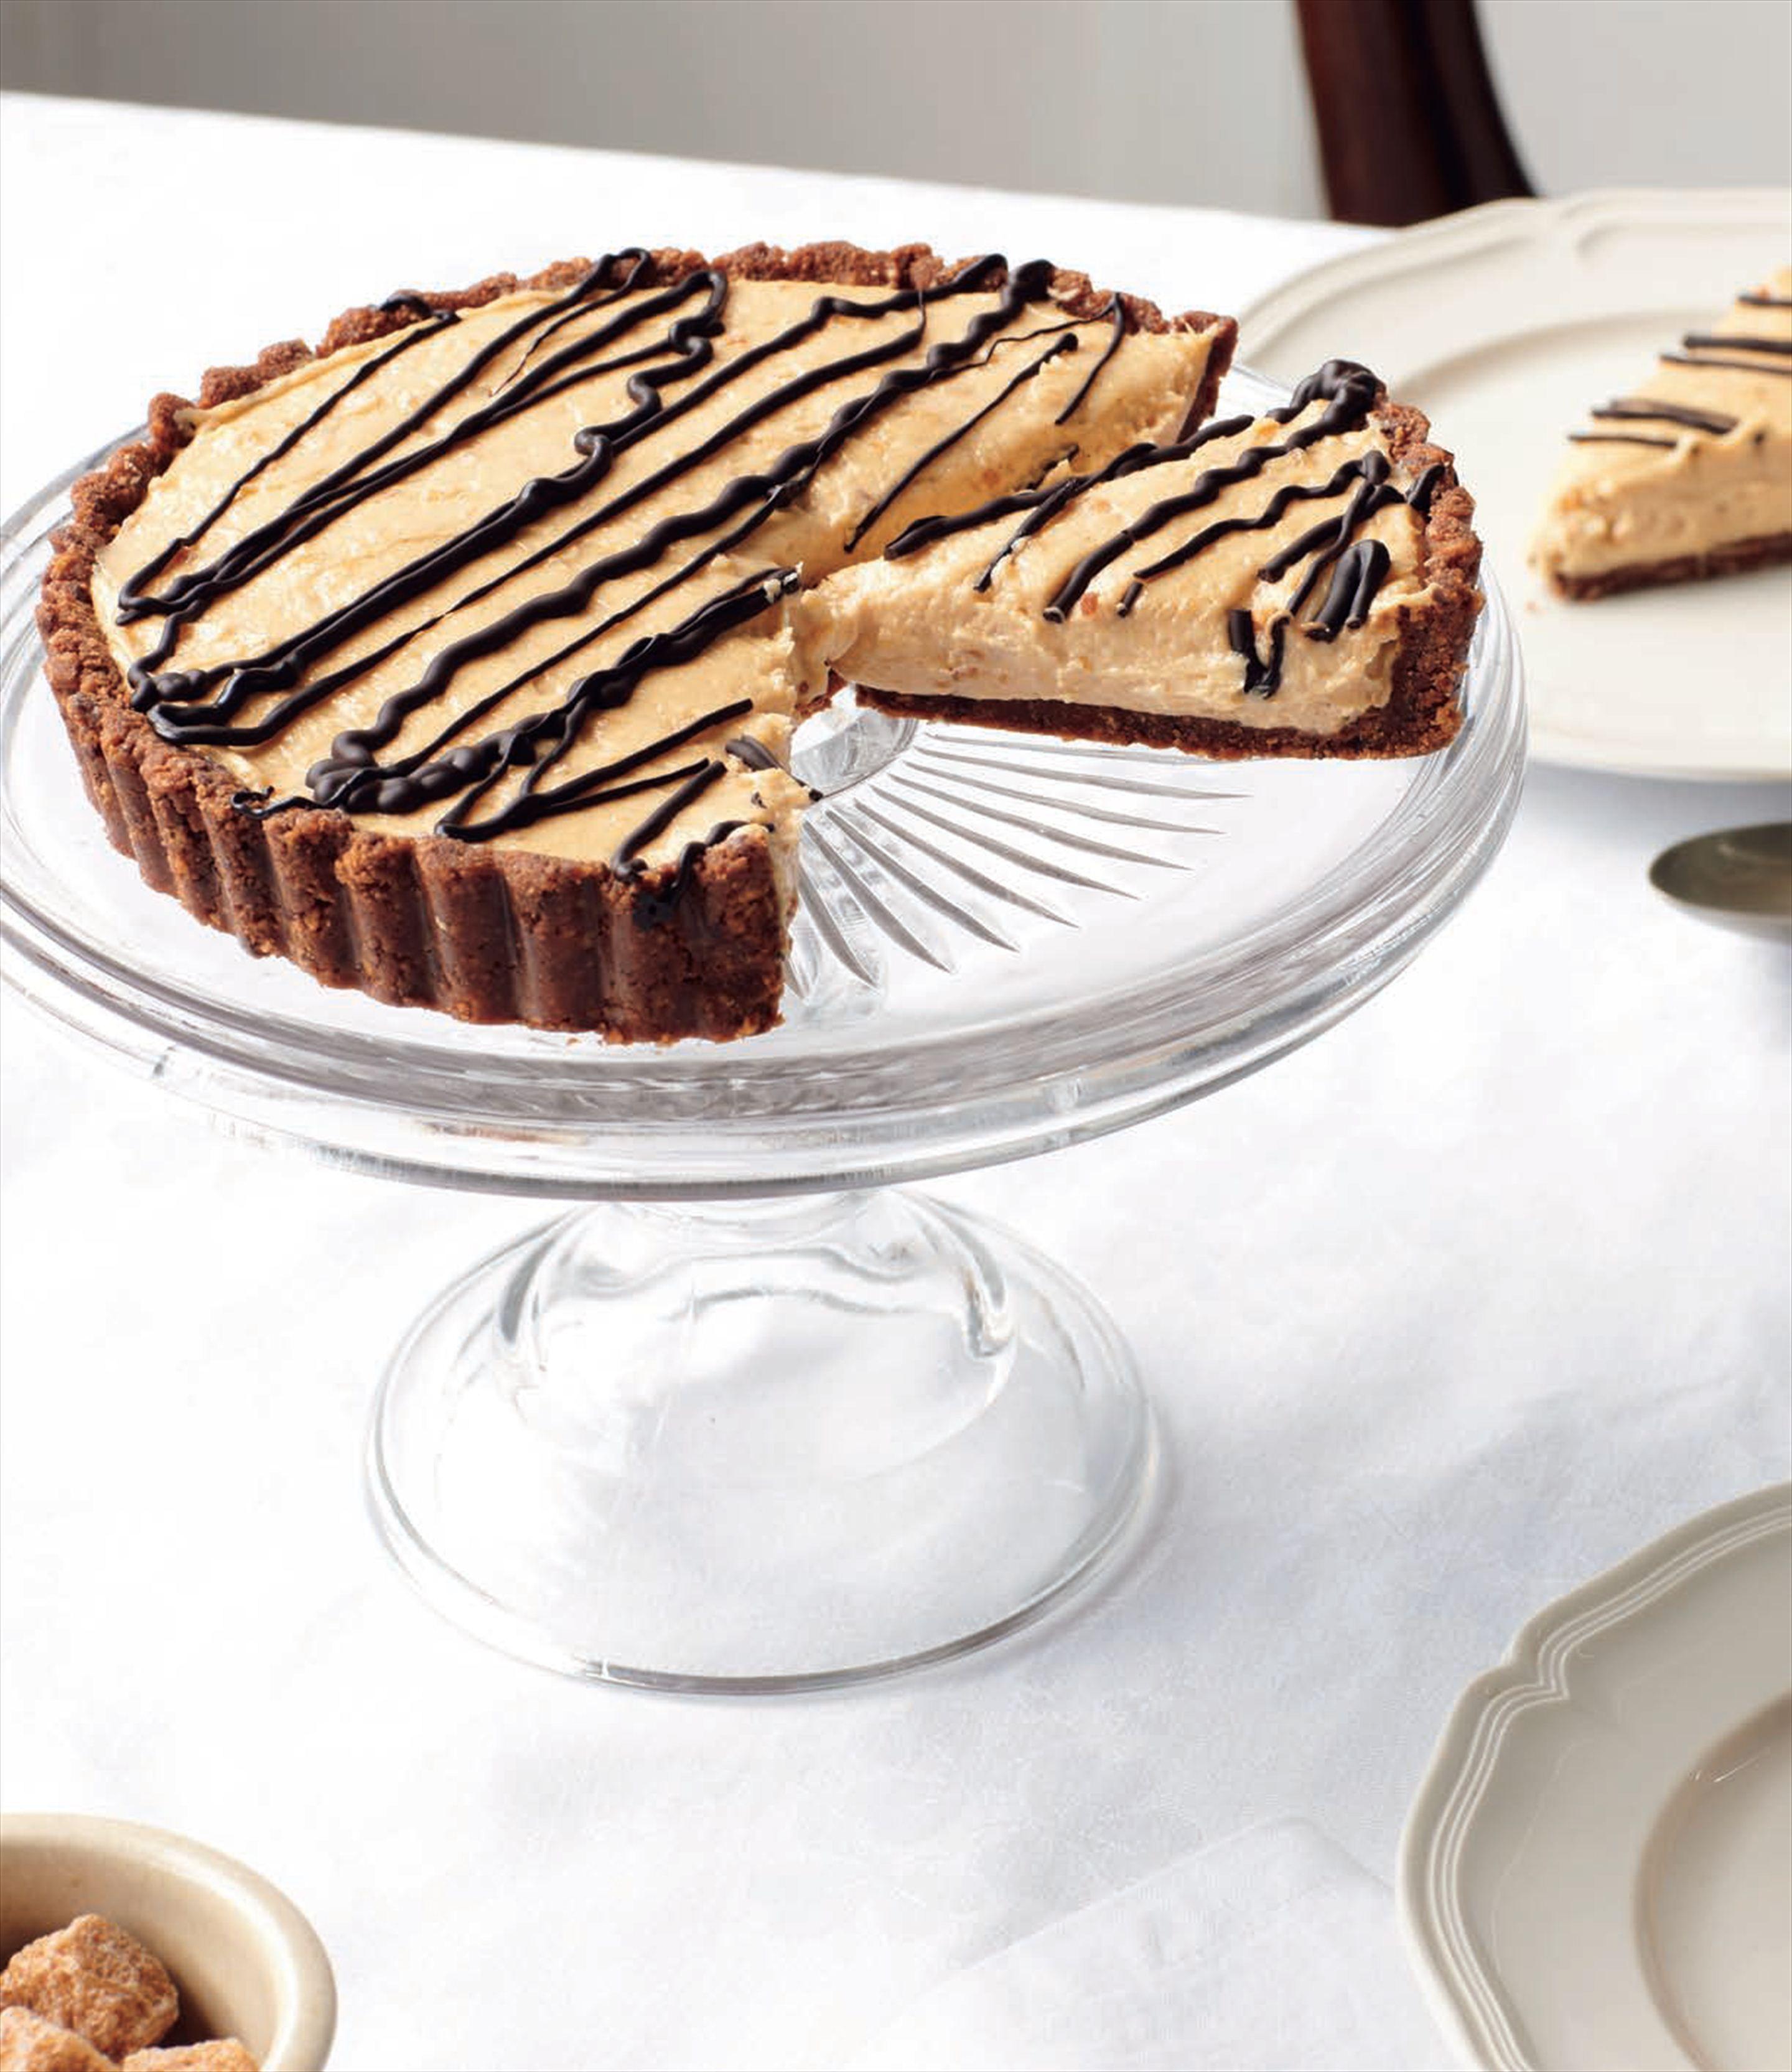 Chocolate Peanut Butter Cheesecake Recipe From Baking By Margaret Peanut Butter Cheesecake Recipes Chocolate Peanut Butter Cheesecake Peanut Butter Cheesecake